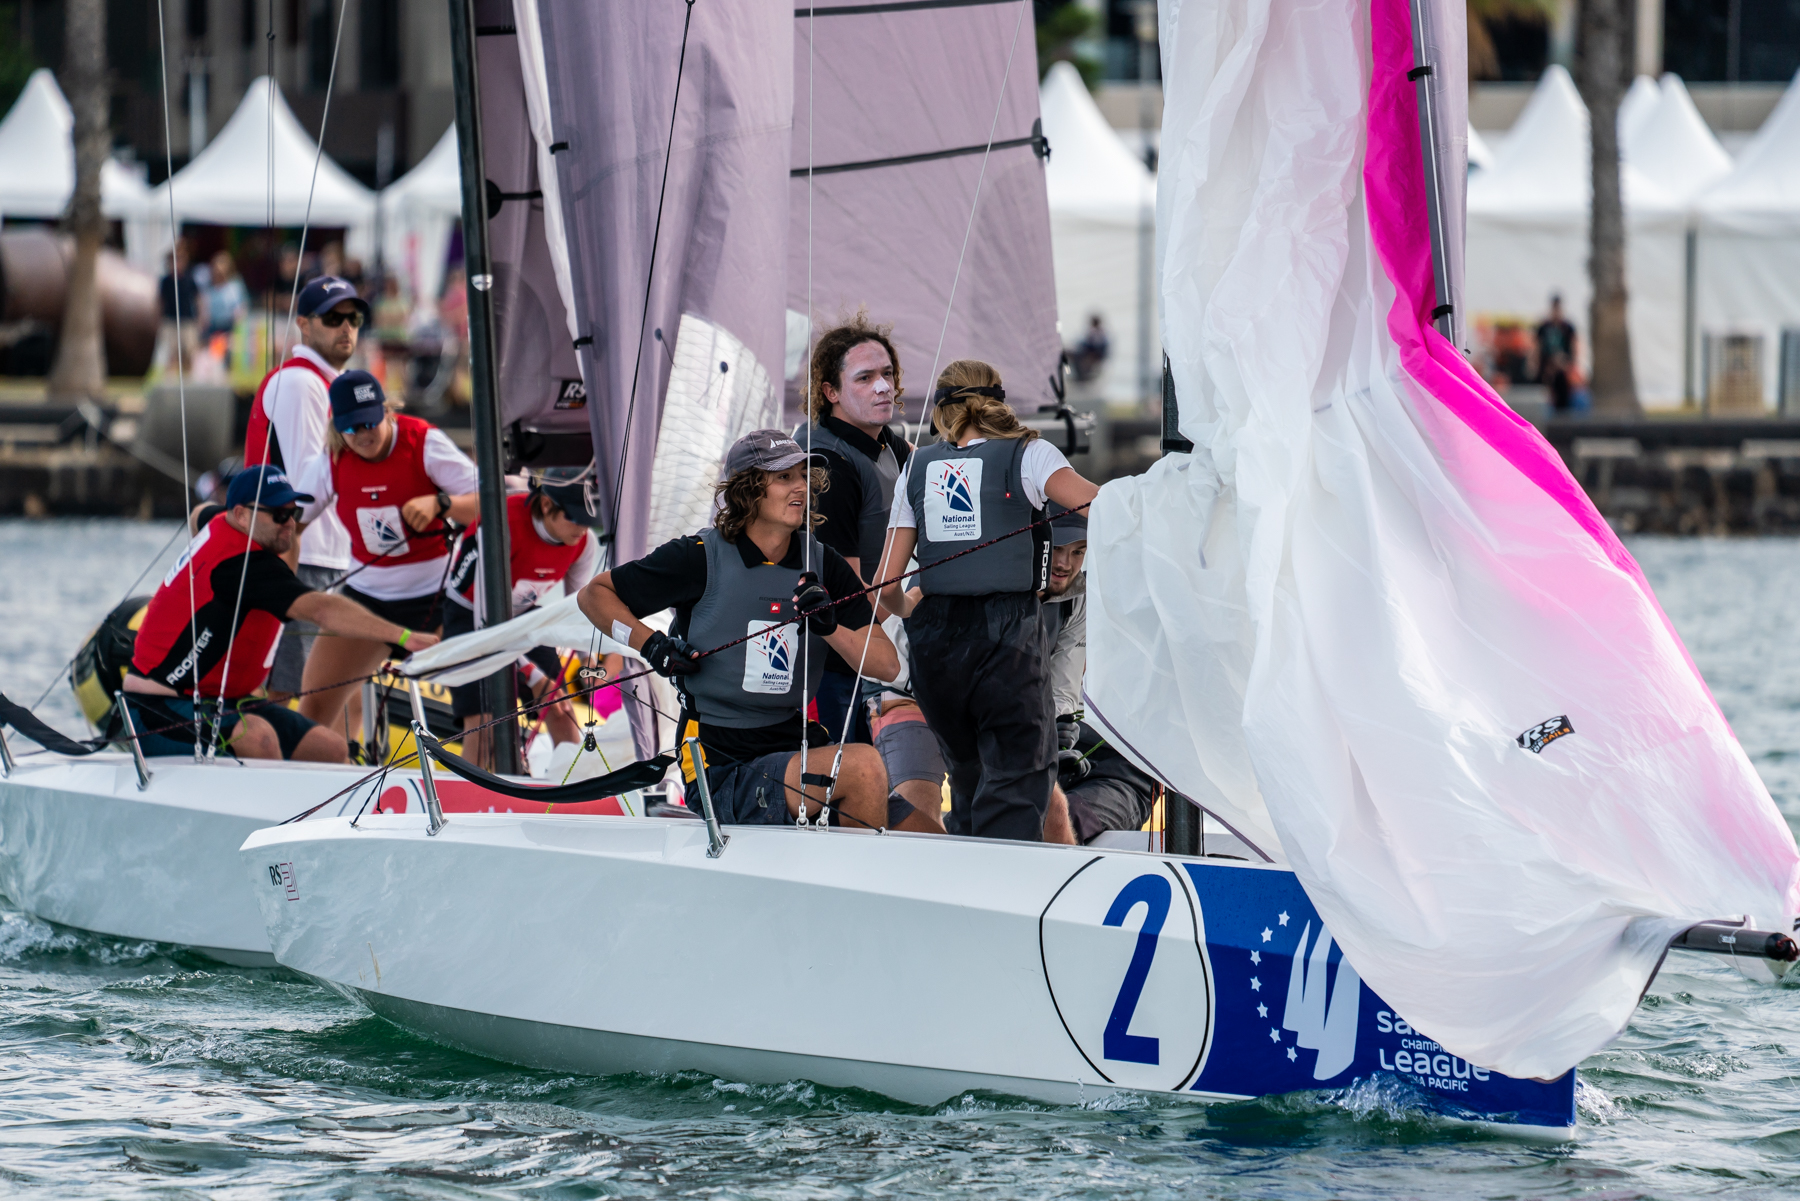 Derwent Sailing Squadron leads Royal Brighton yacht Club - Beau Outteridge pic